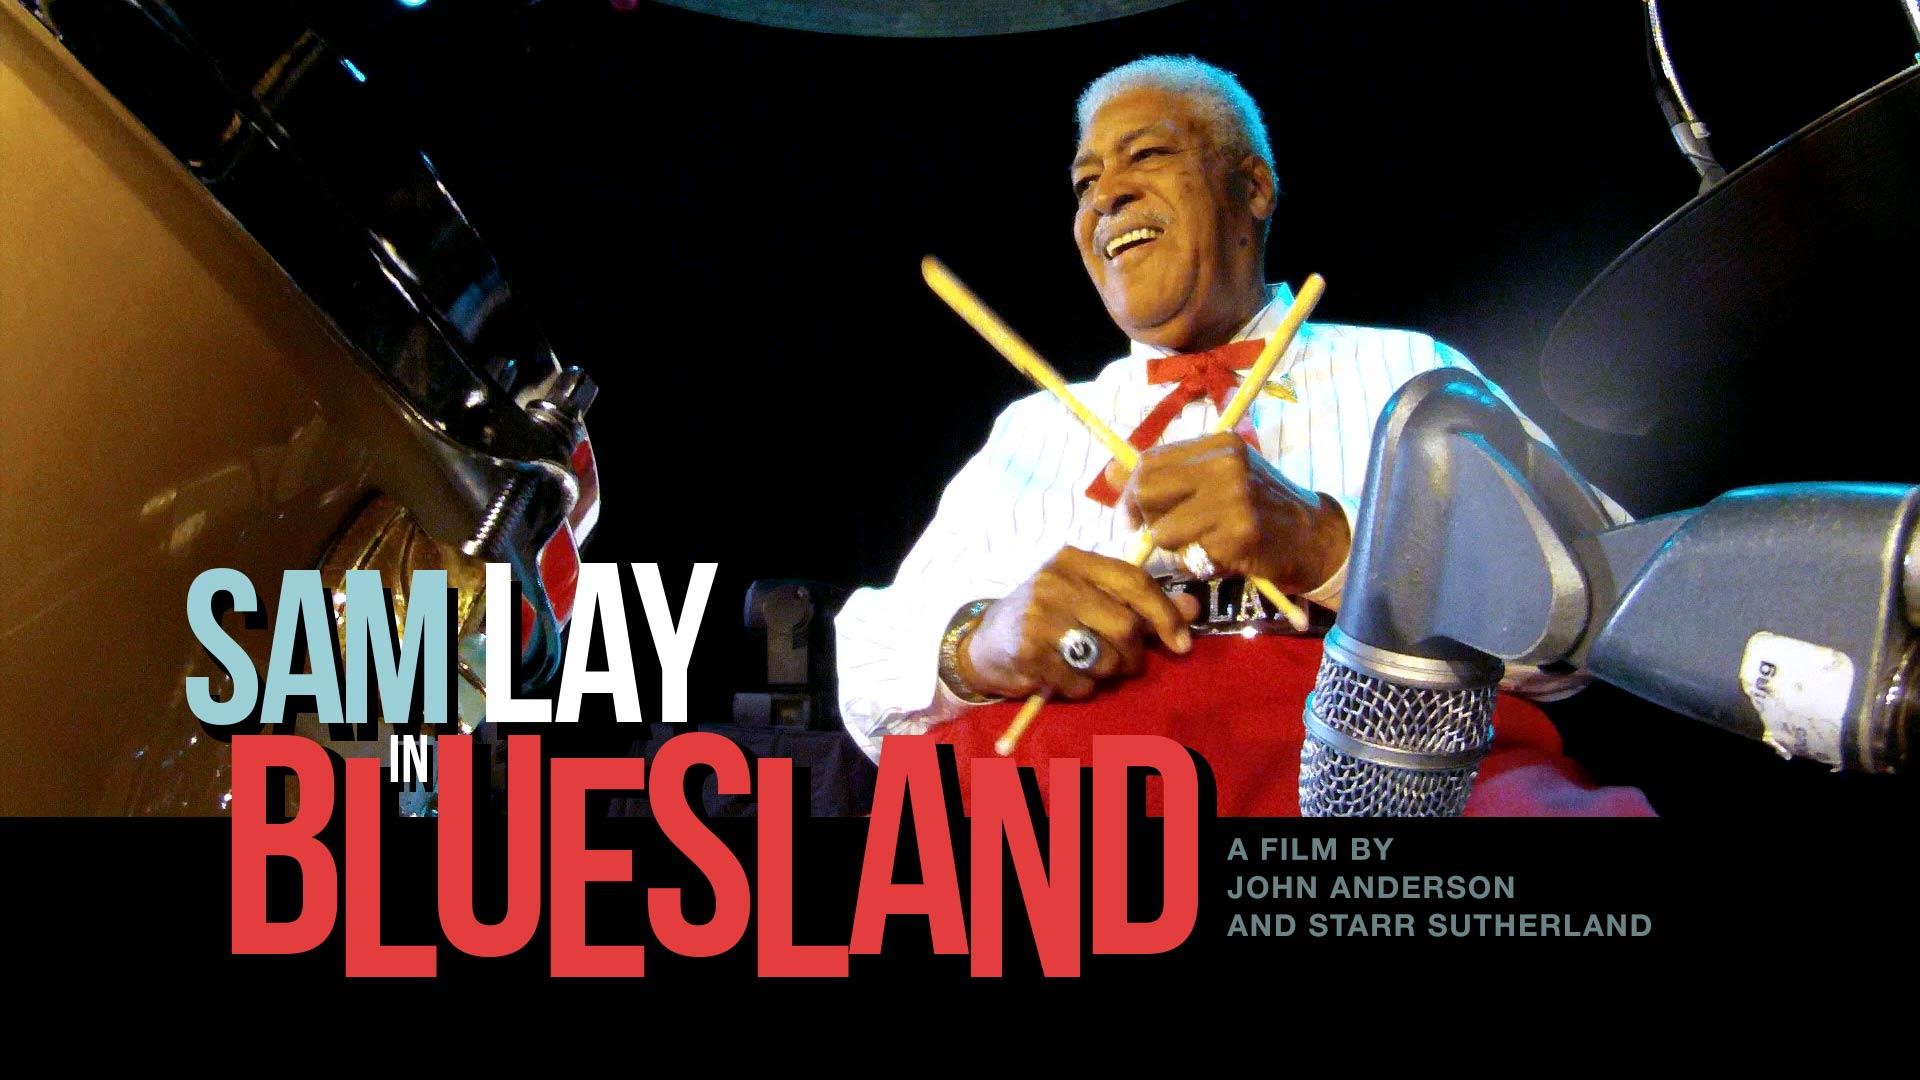 Sam Lay In Bluesland